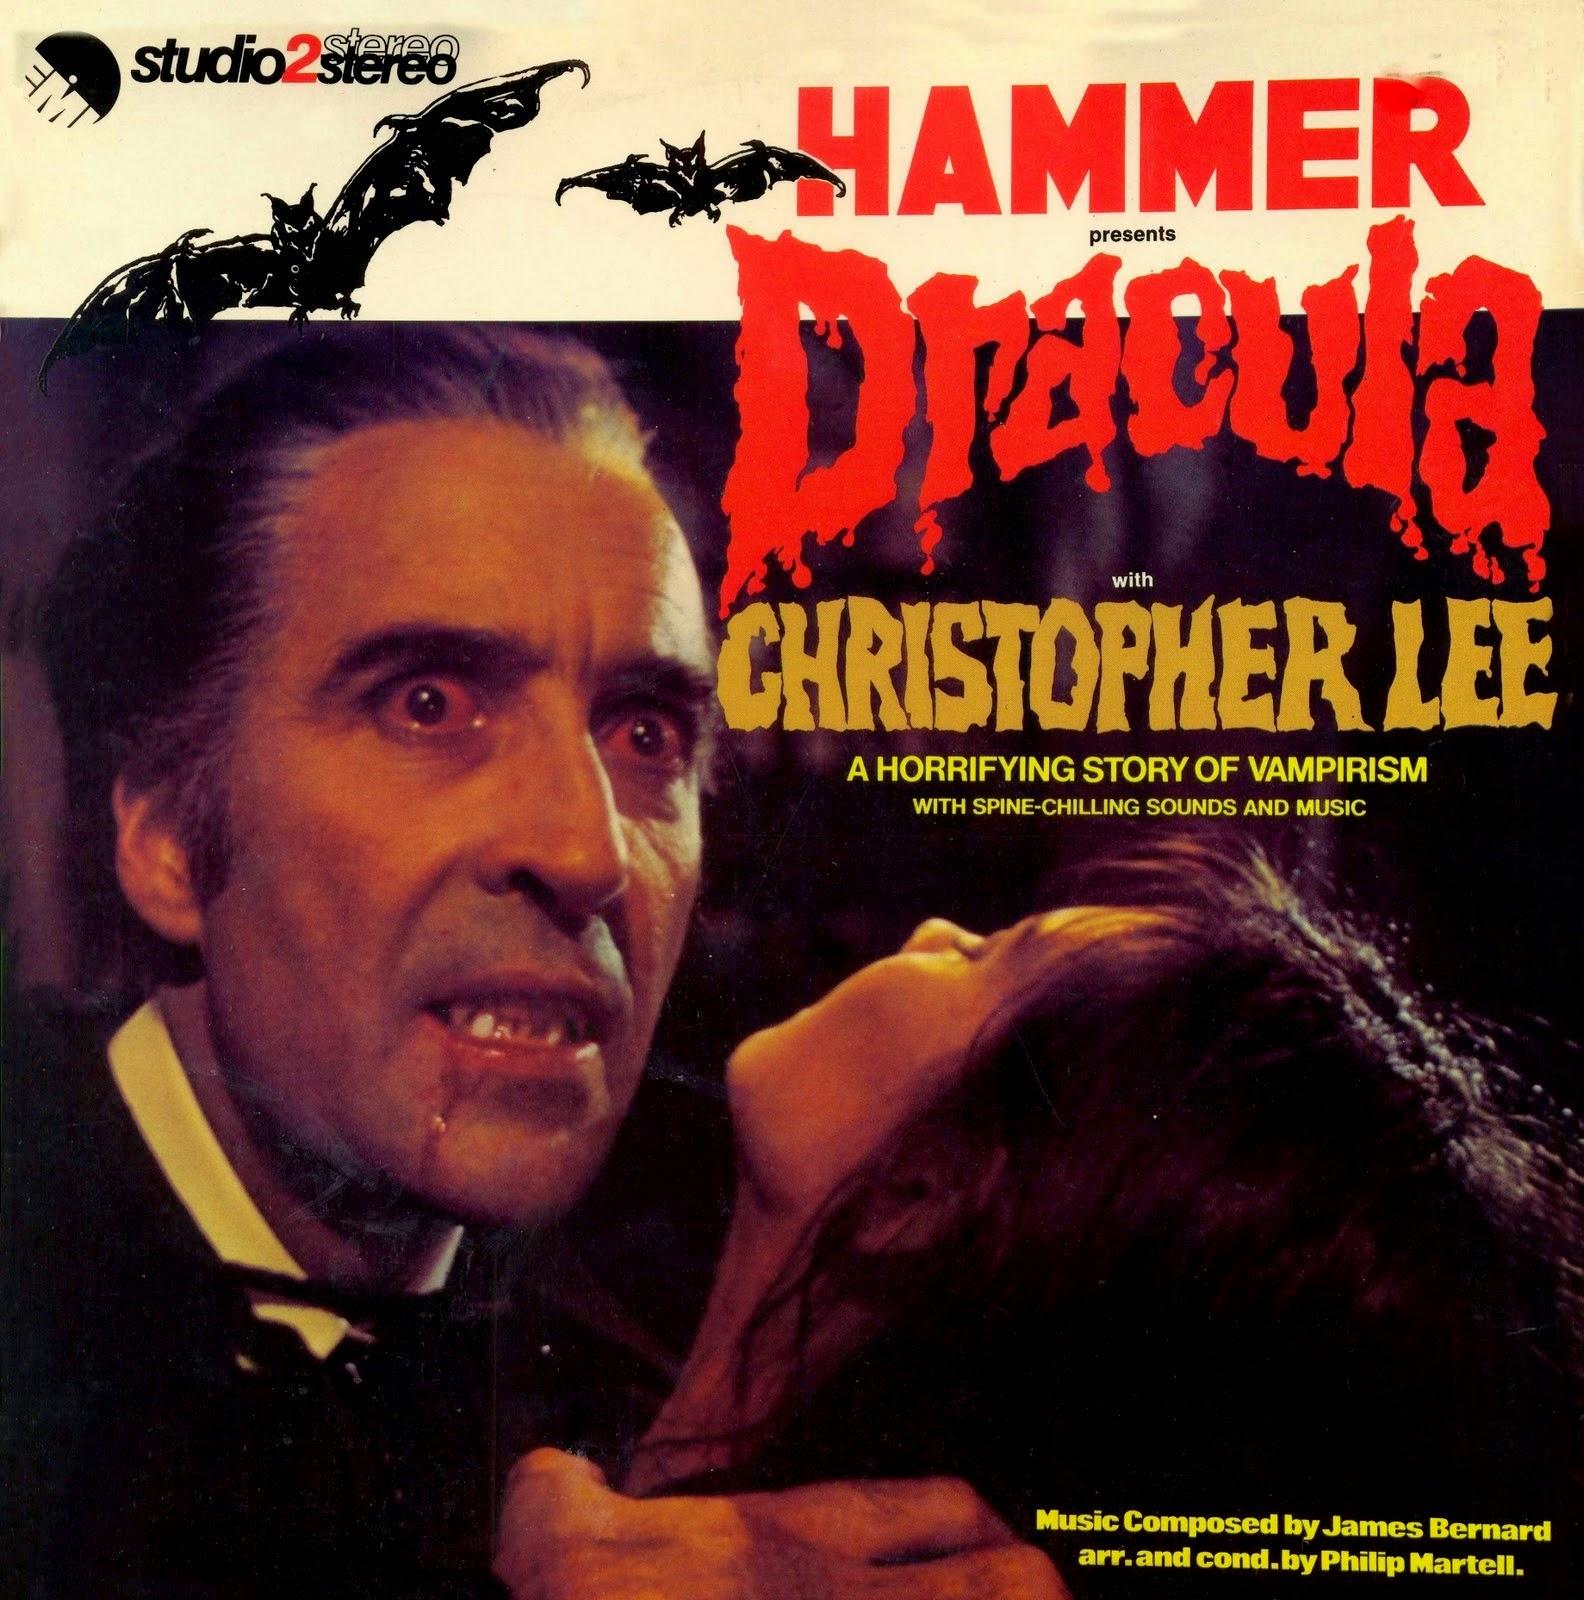 Naptown Nerd: Who Sucks Least - Ranking The Hammer Dracula ...